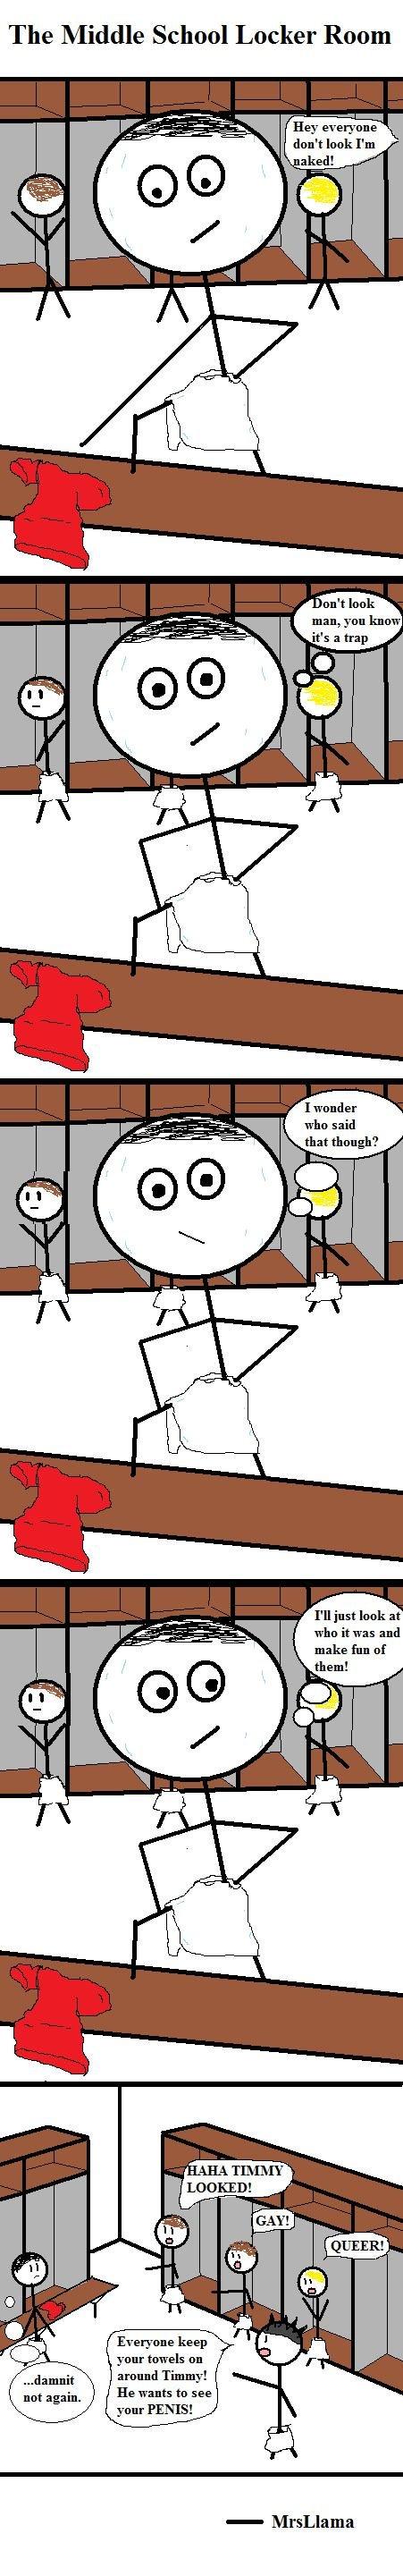 Middle School Locker Room. Original Content<br /> Middle School Fights: funnyjunk.com/funny_pictures/1206455/Middle+School+Fights/<br /> First Day D poor Timmy